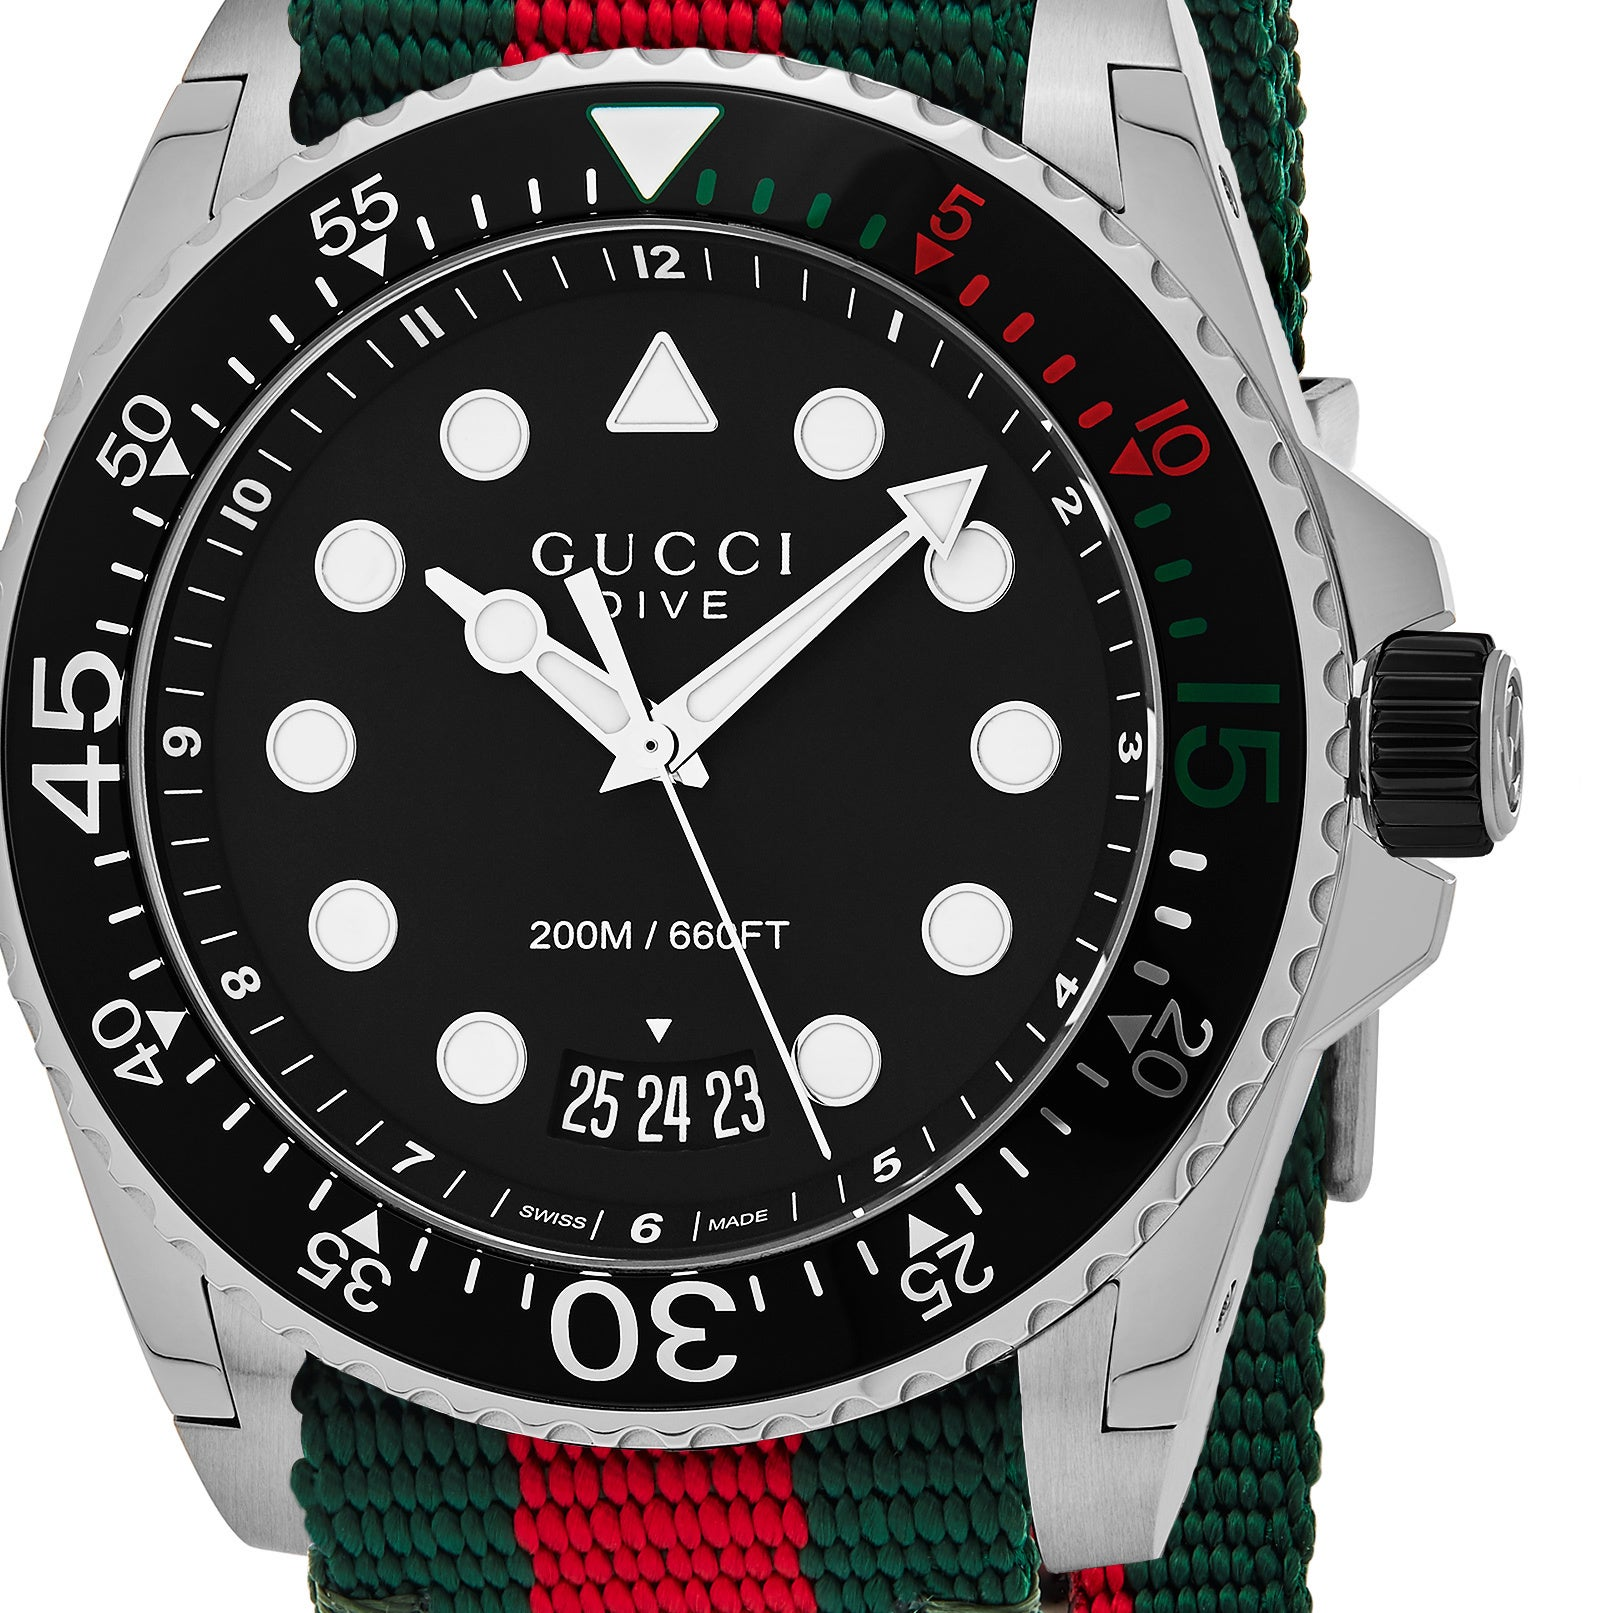 0f3033e21ec Shop Gucci Men s  Dive  Black Dial Green Red Nylon Strap Swiss Quartz Watch  - Free Shipping Today - Overstock - 13985891